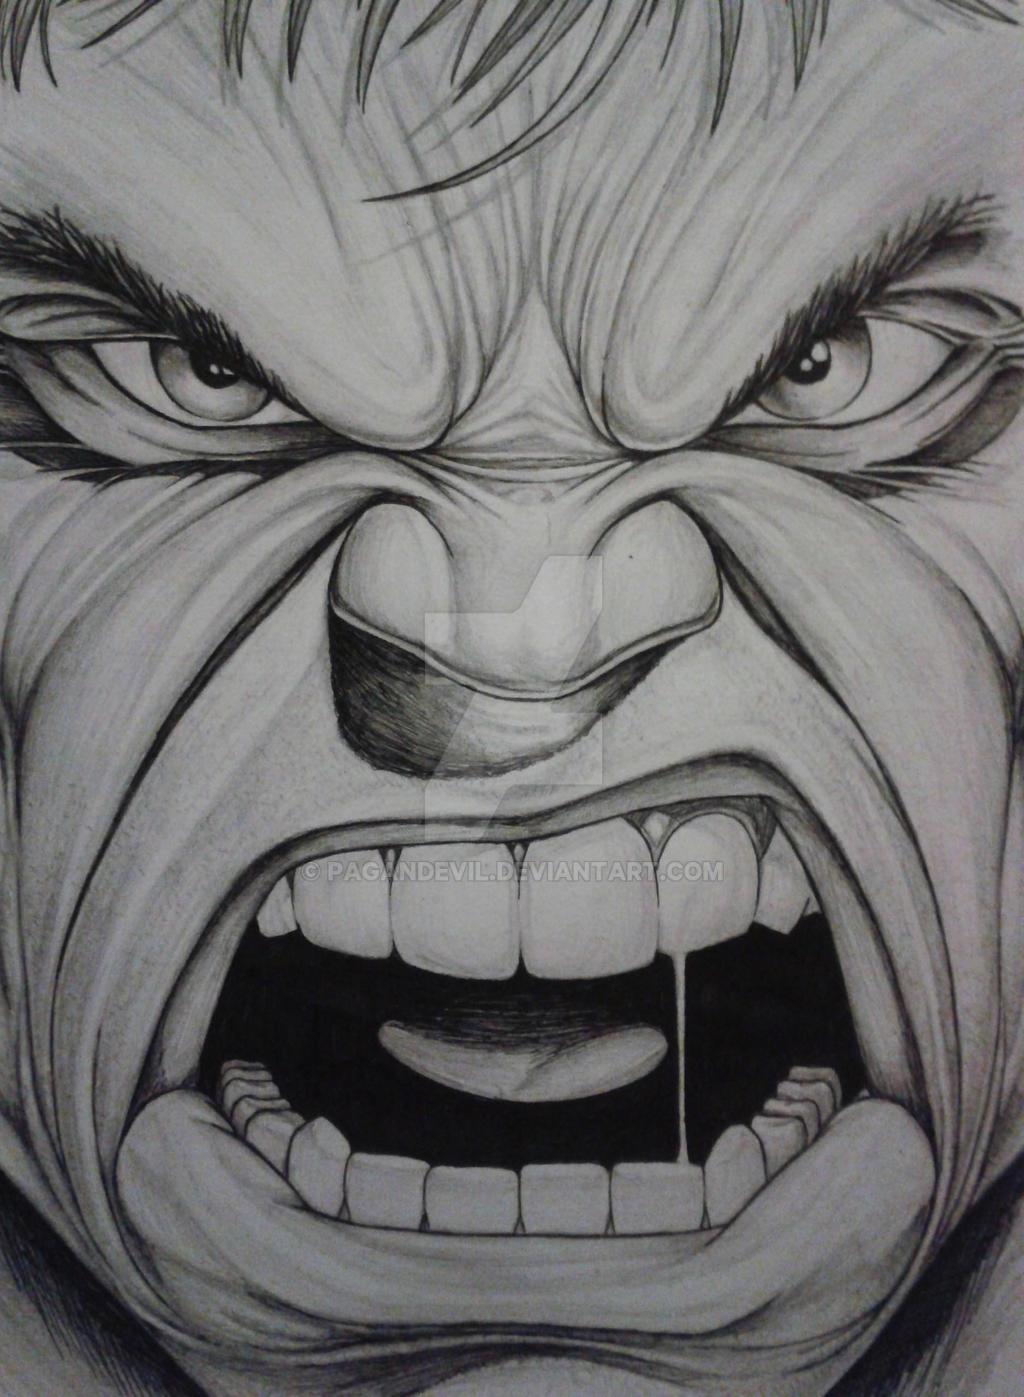 Hulk Face Line Drawing : Hulk face drawing imgkid the image kid has it